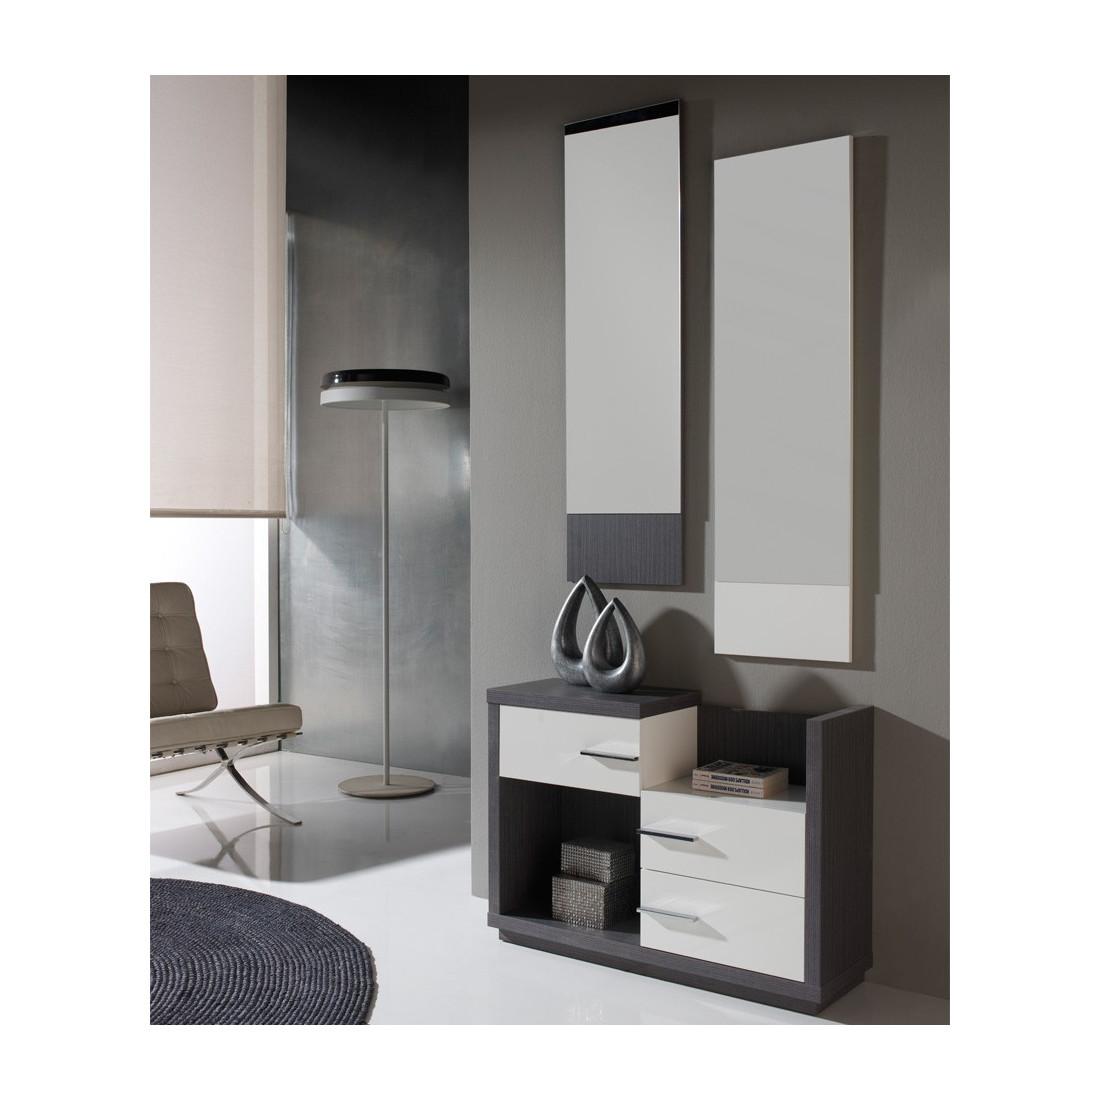 Meuble d 39 entr e cendre miroirs colby univers petits meubles - Meuble d entree miroir ...